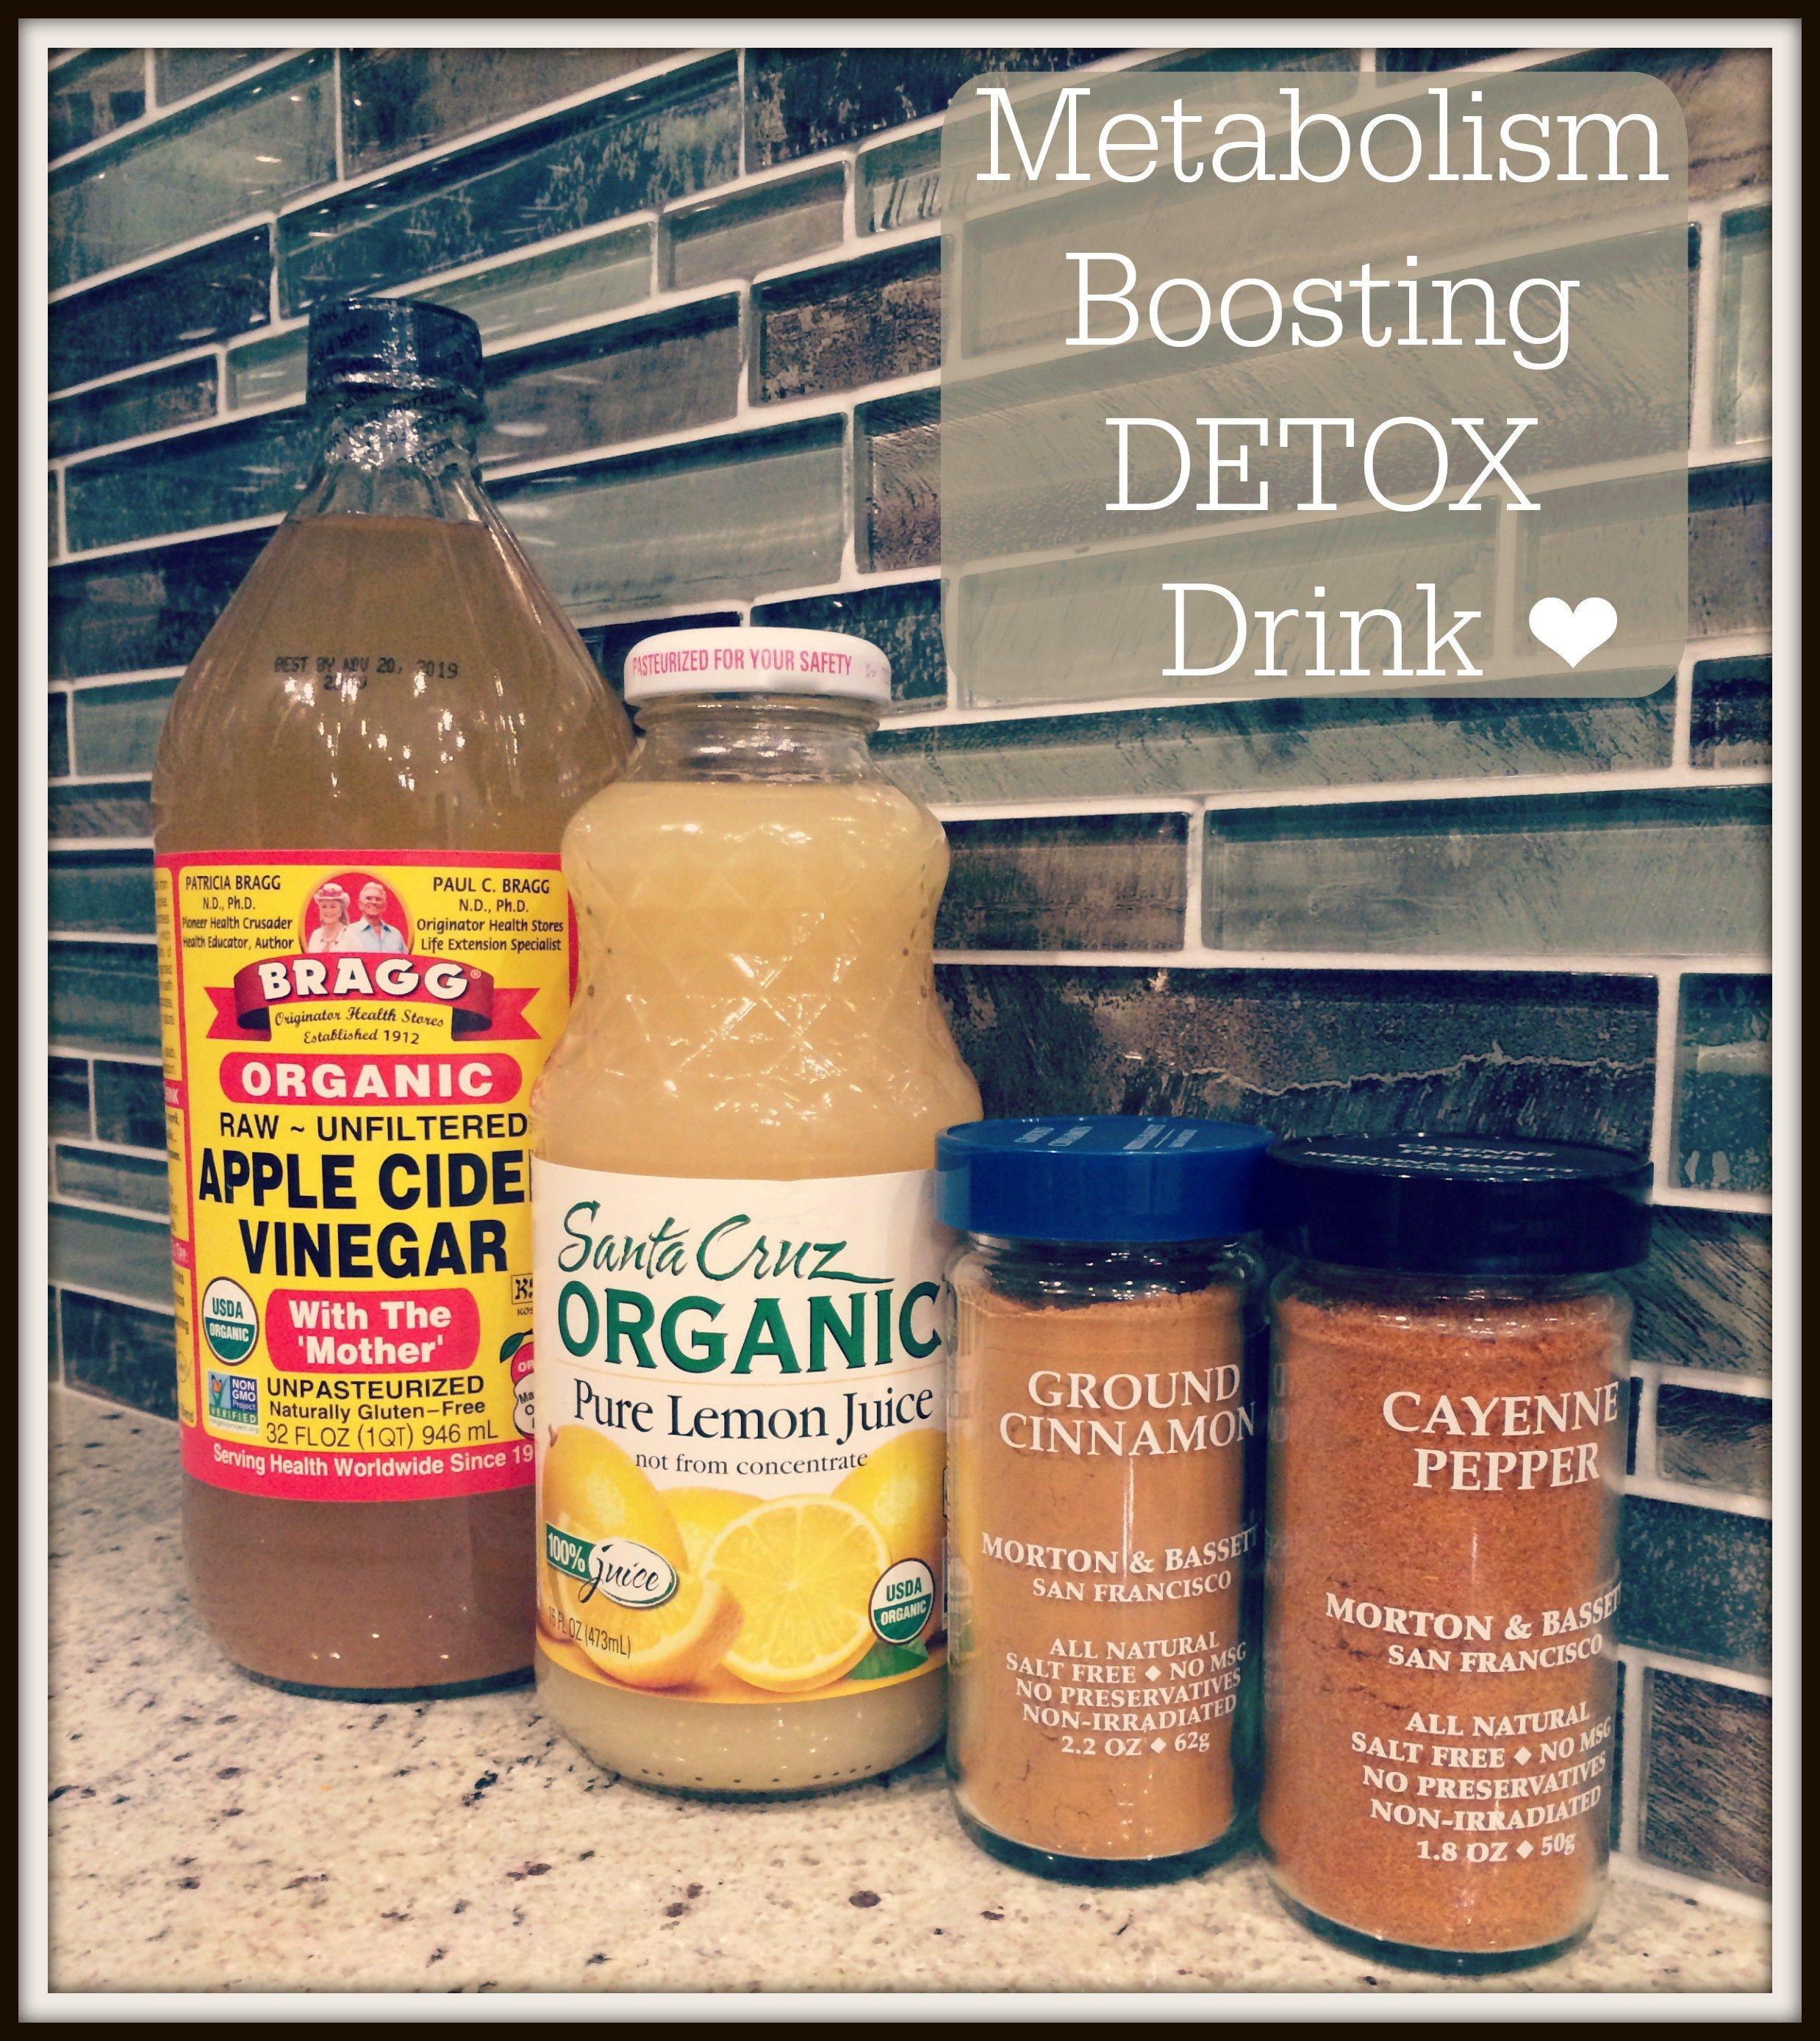 Metabolism Boosting Detox Drink Obsessed By Portia Recipe Healthy Detox Cleanse Detox Drinks Detox Drinks Recipes